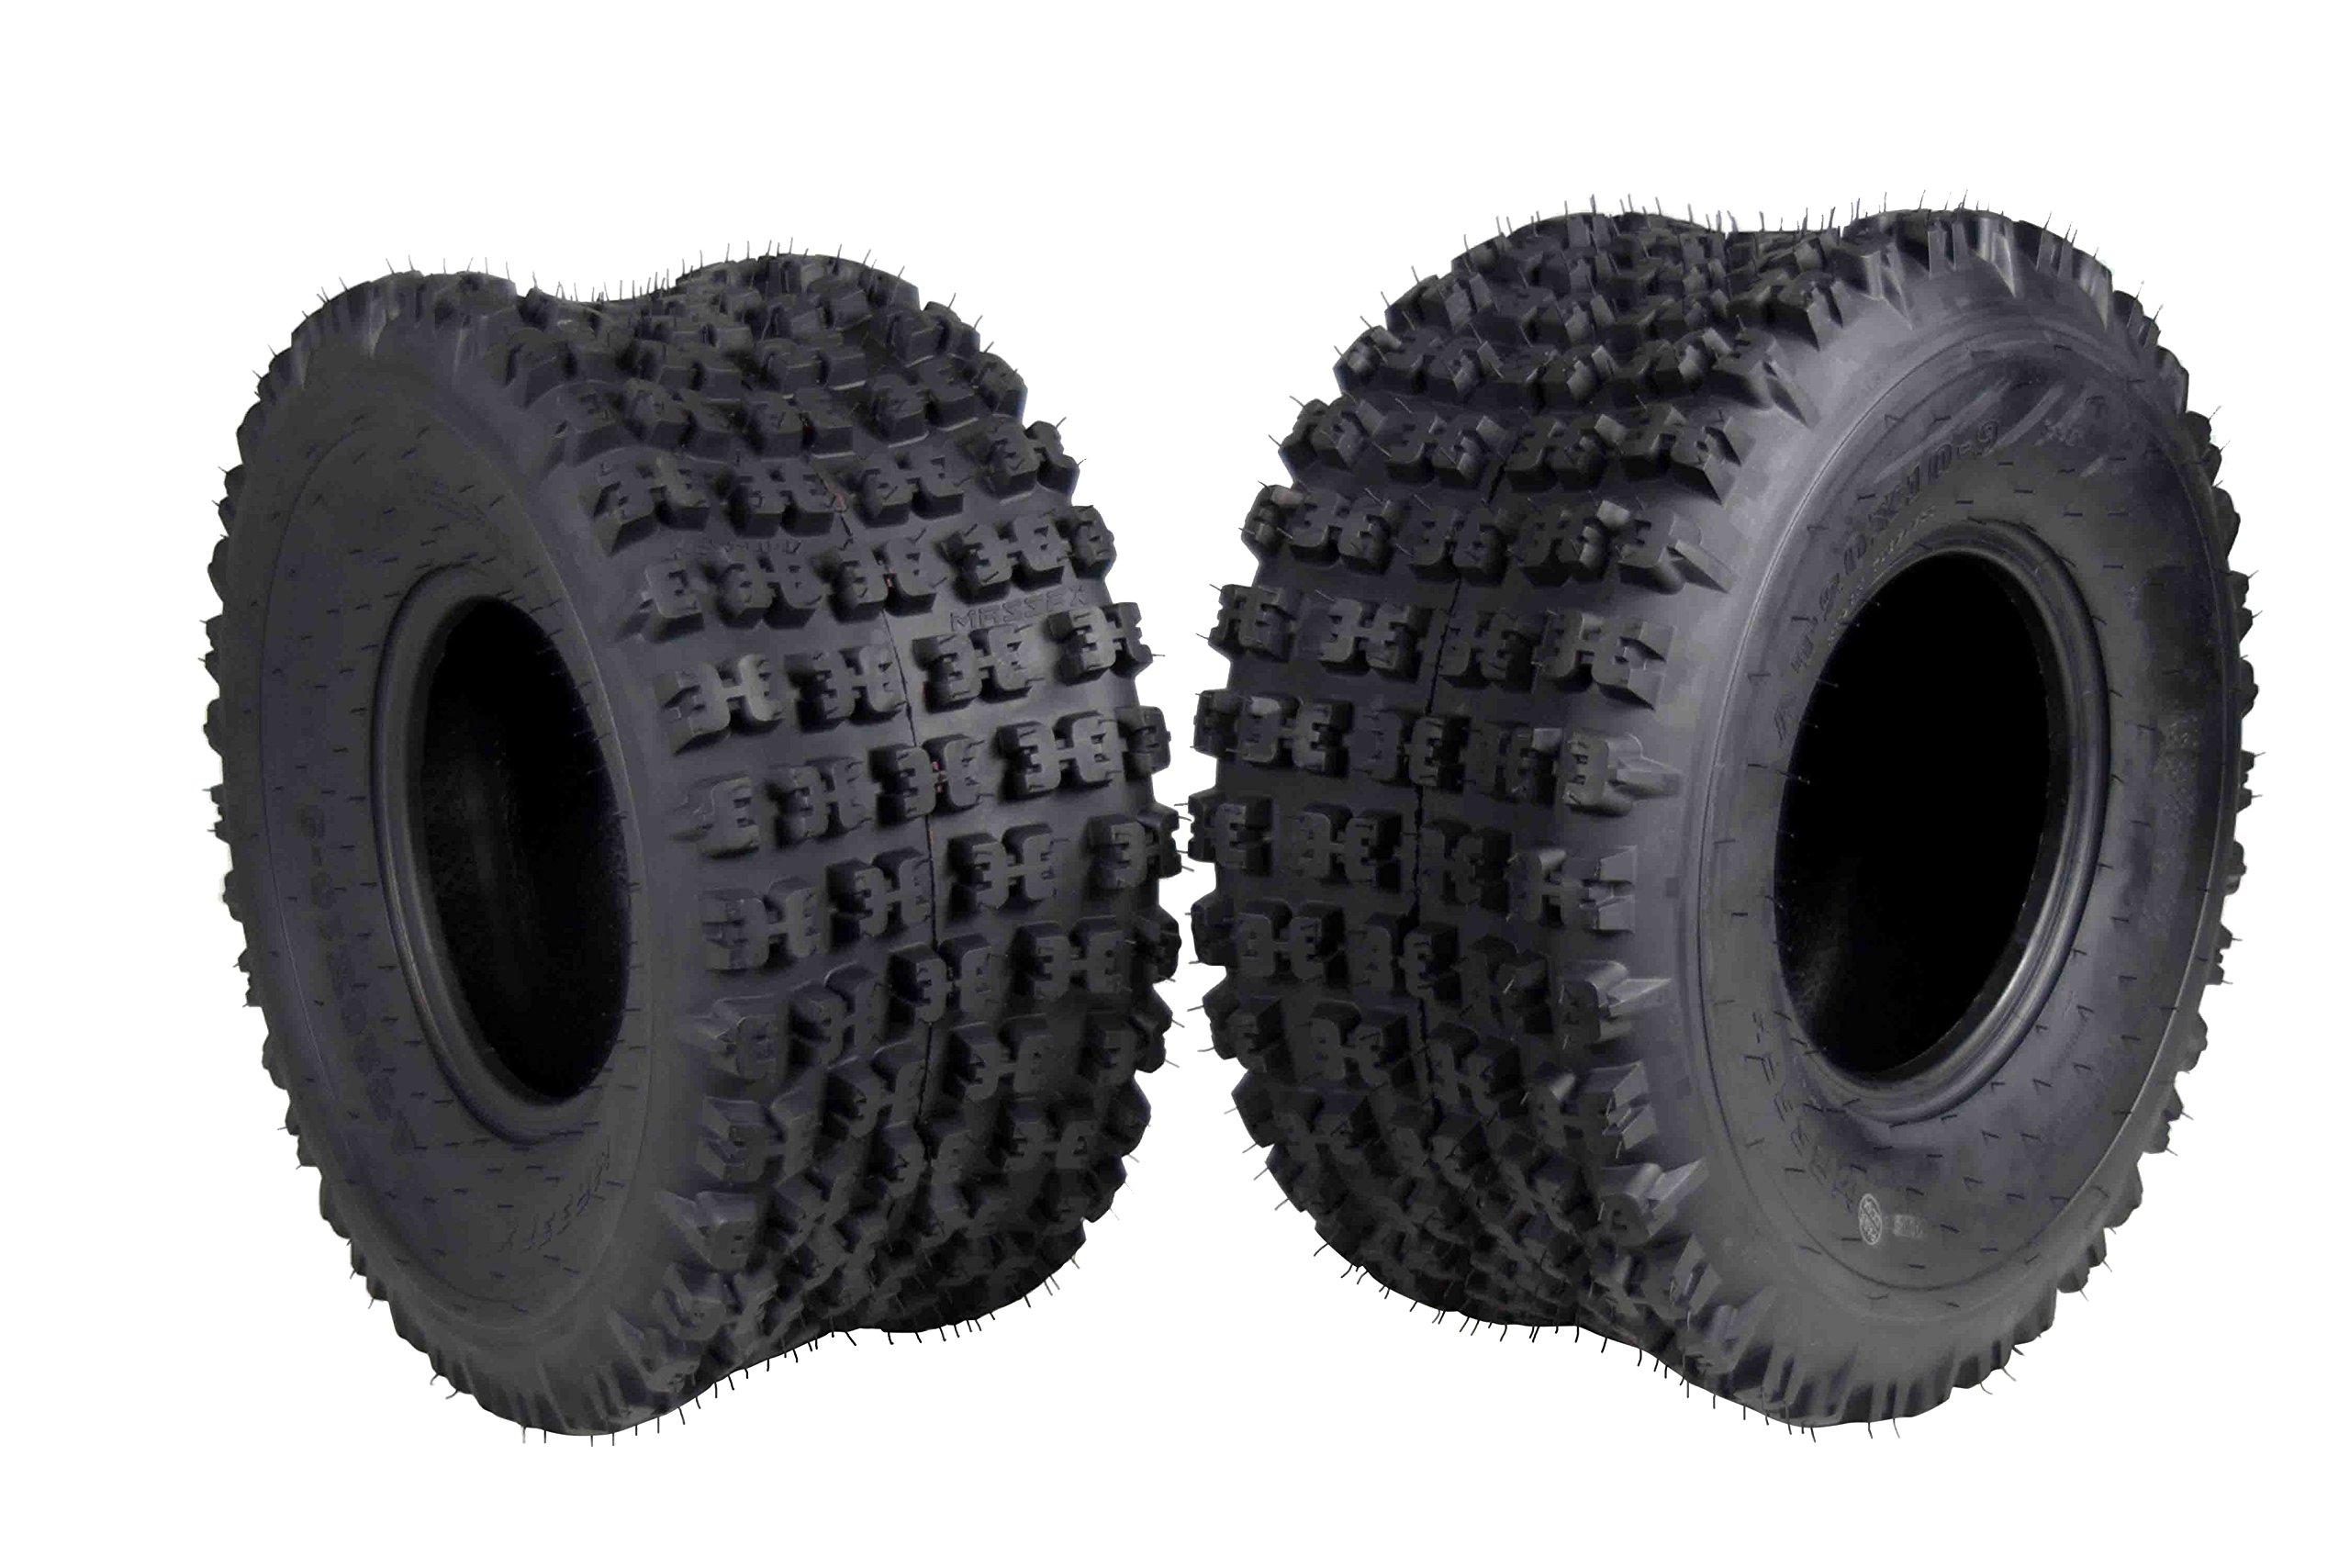 2 Set MASSFX 20X10-9 Dual Compound EOC20109 ATV Tires Rear 6 ply 20x10x9 2 Pack